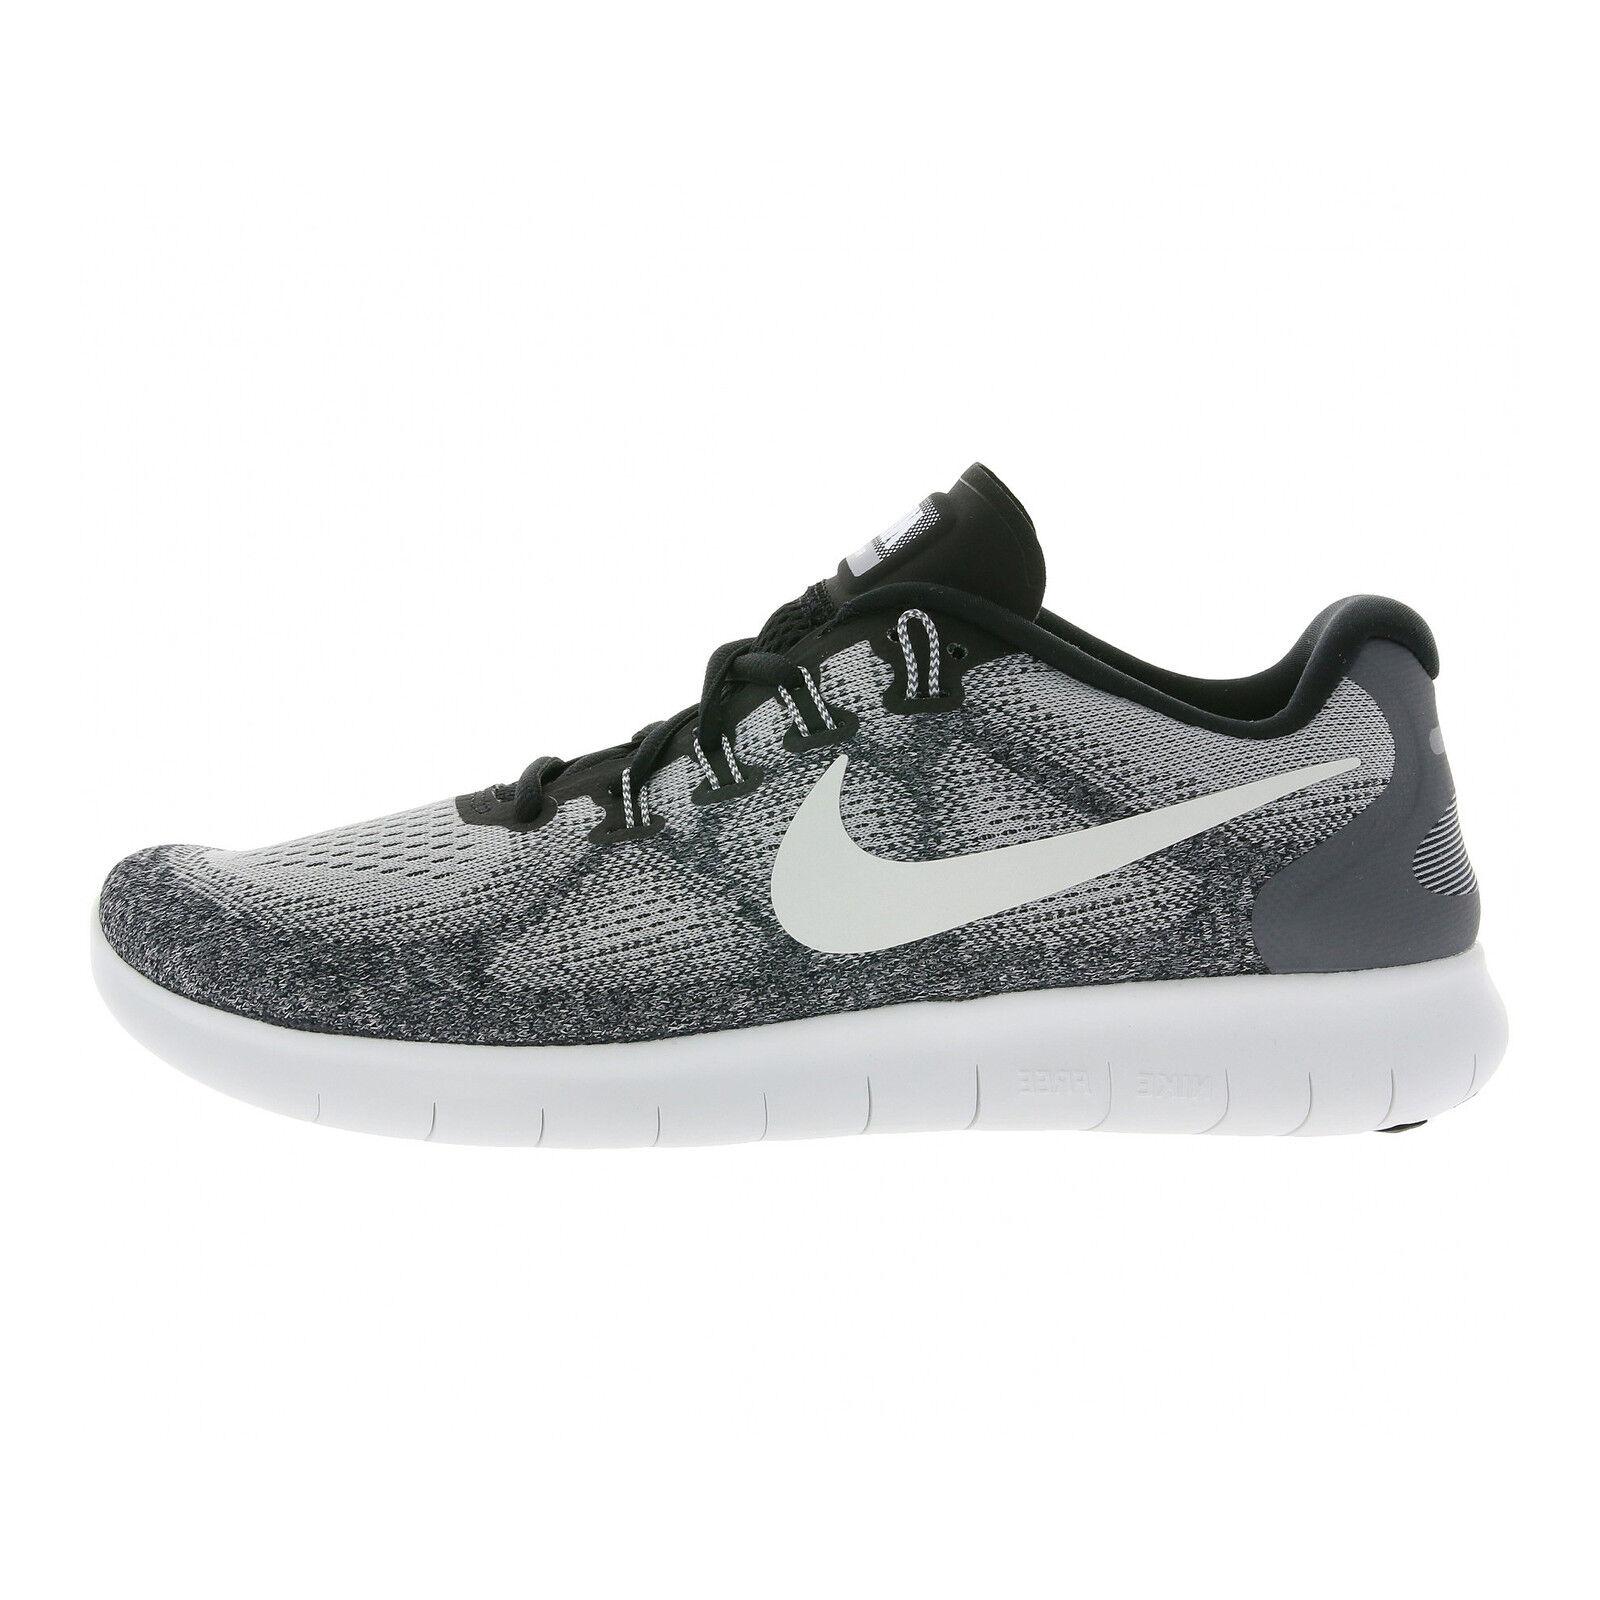 Nike libera nel 2017 880839-002 scarpa da ginnastica corsa sport scarpa da ginnastica da durante il tempo libero ee2682